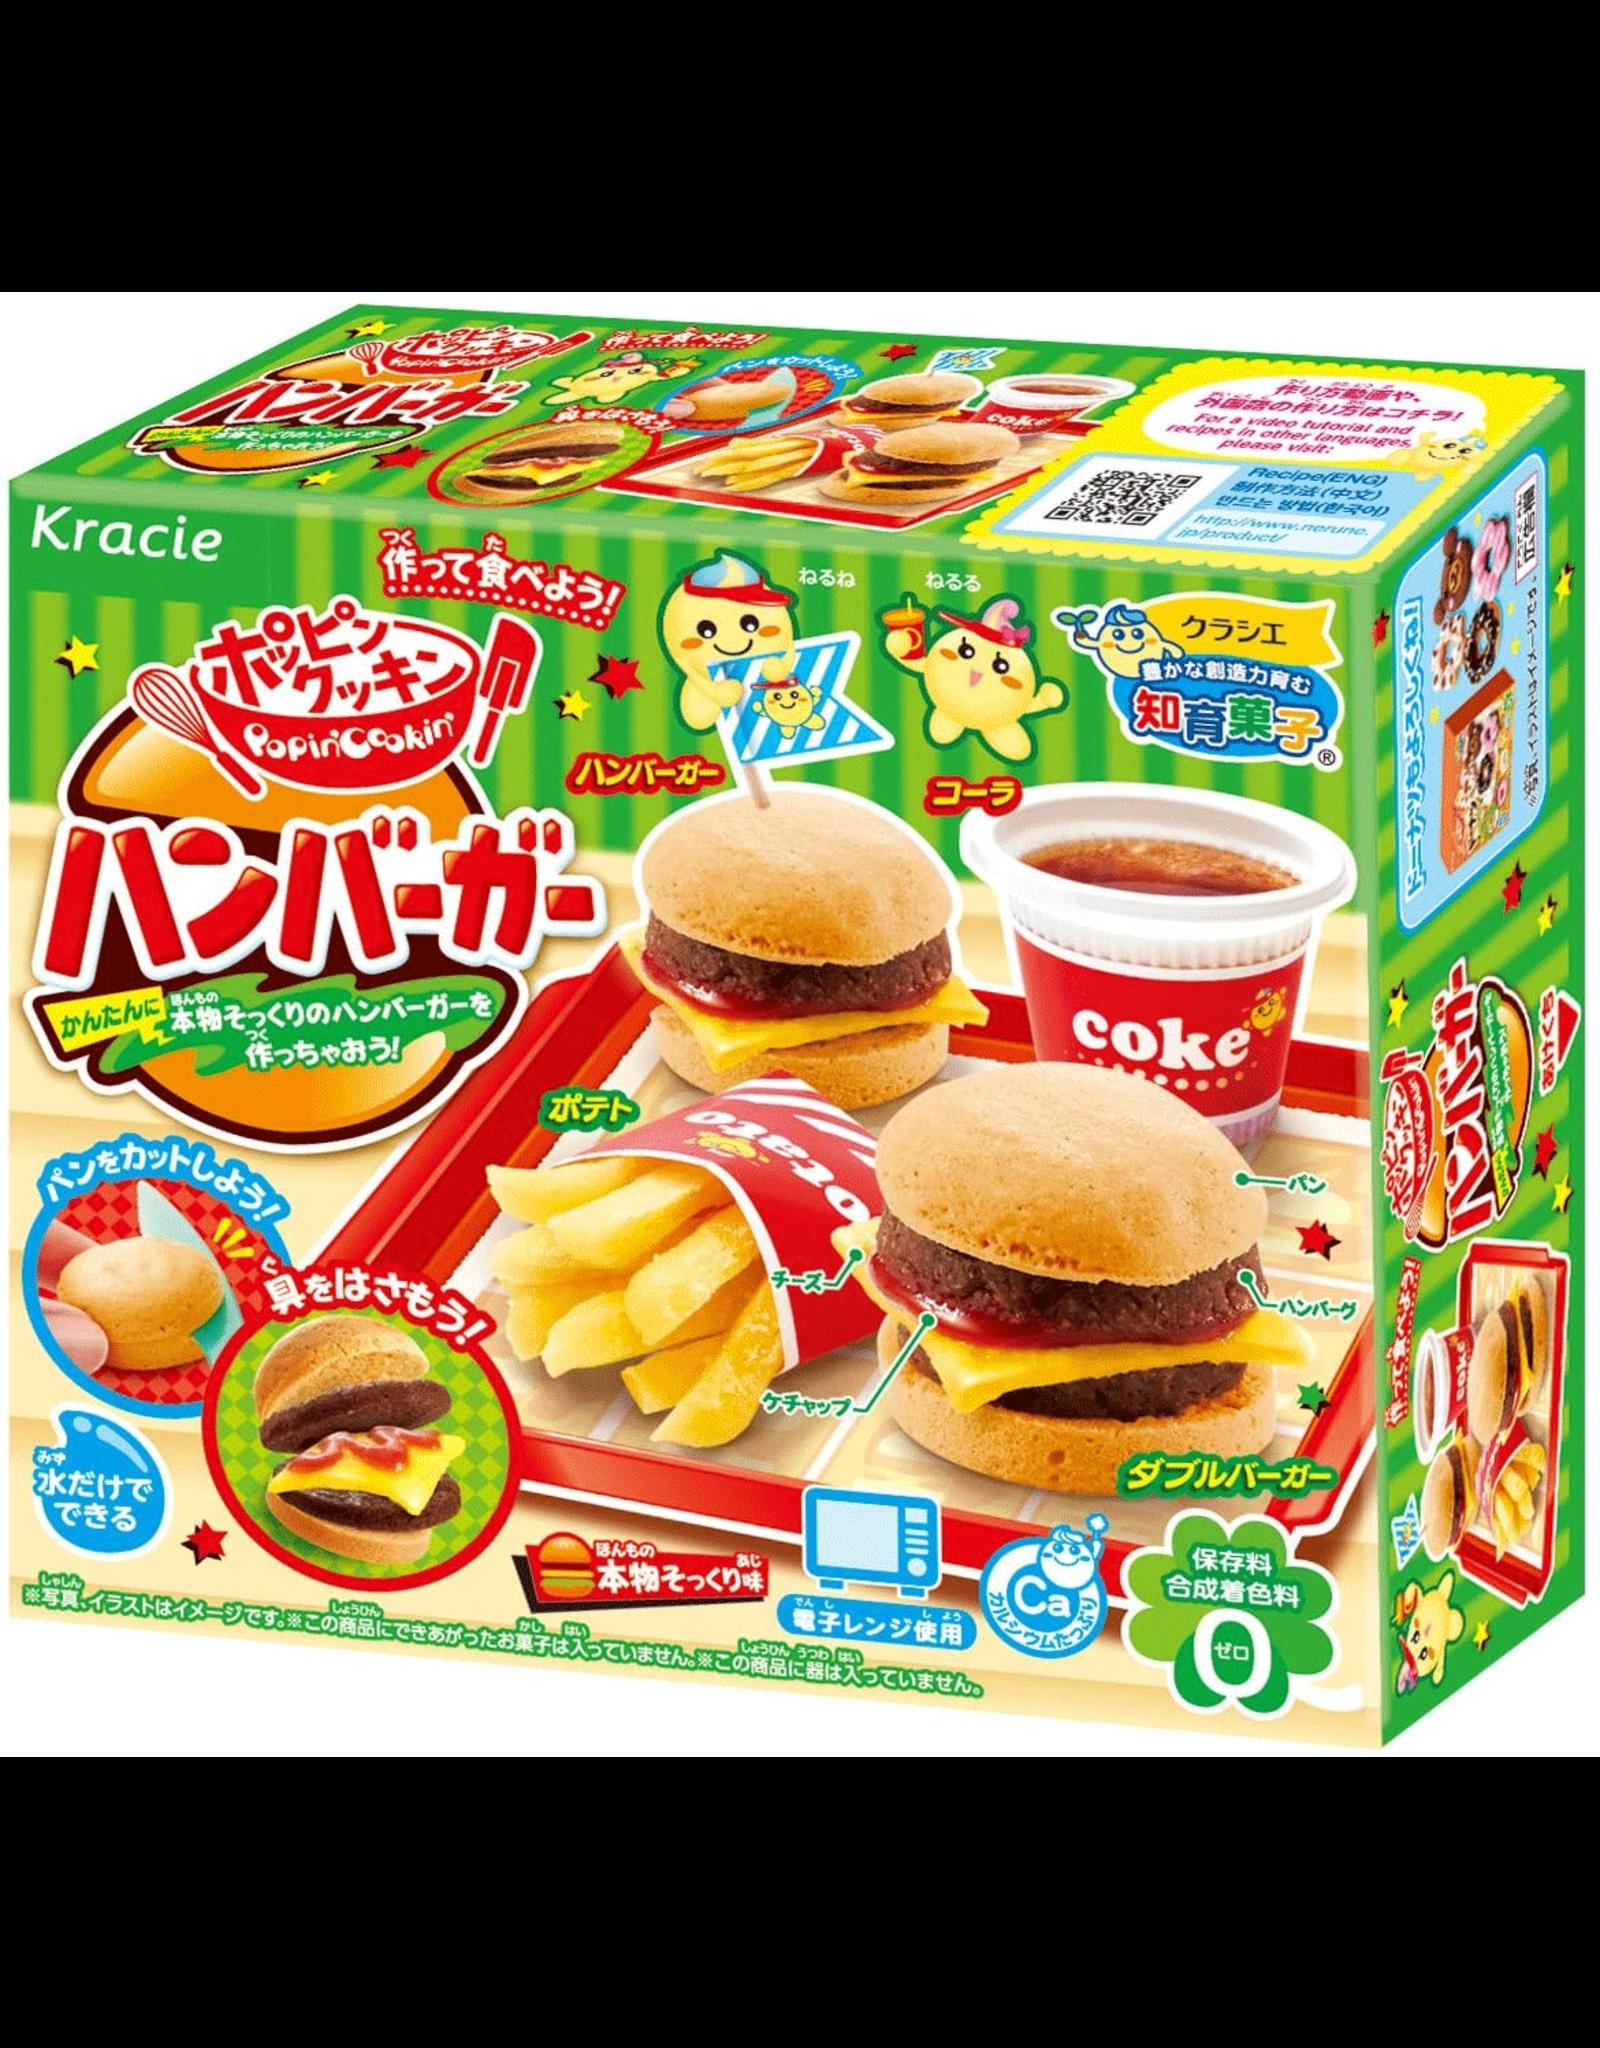 DIY Candy - Popin' Cookin' Hamburger